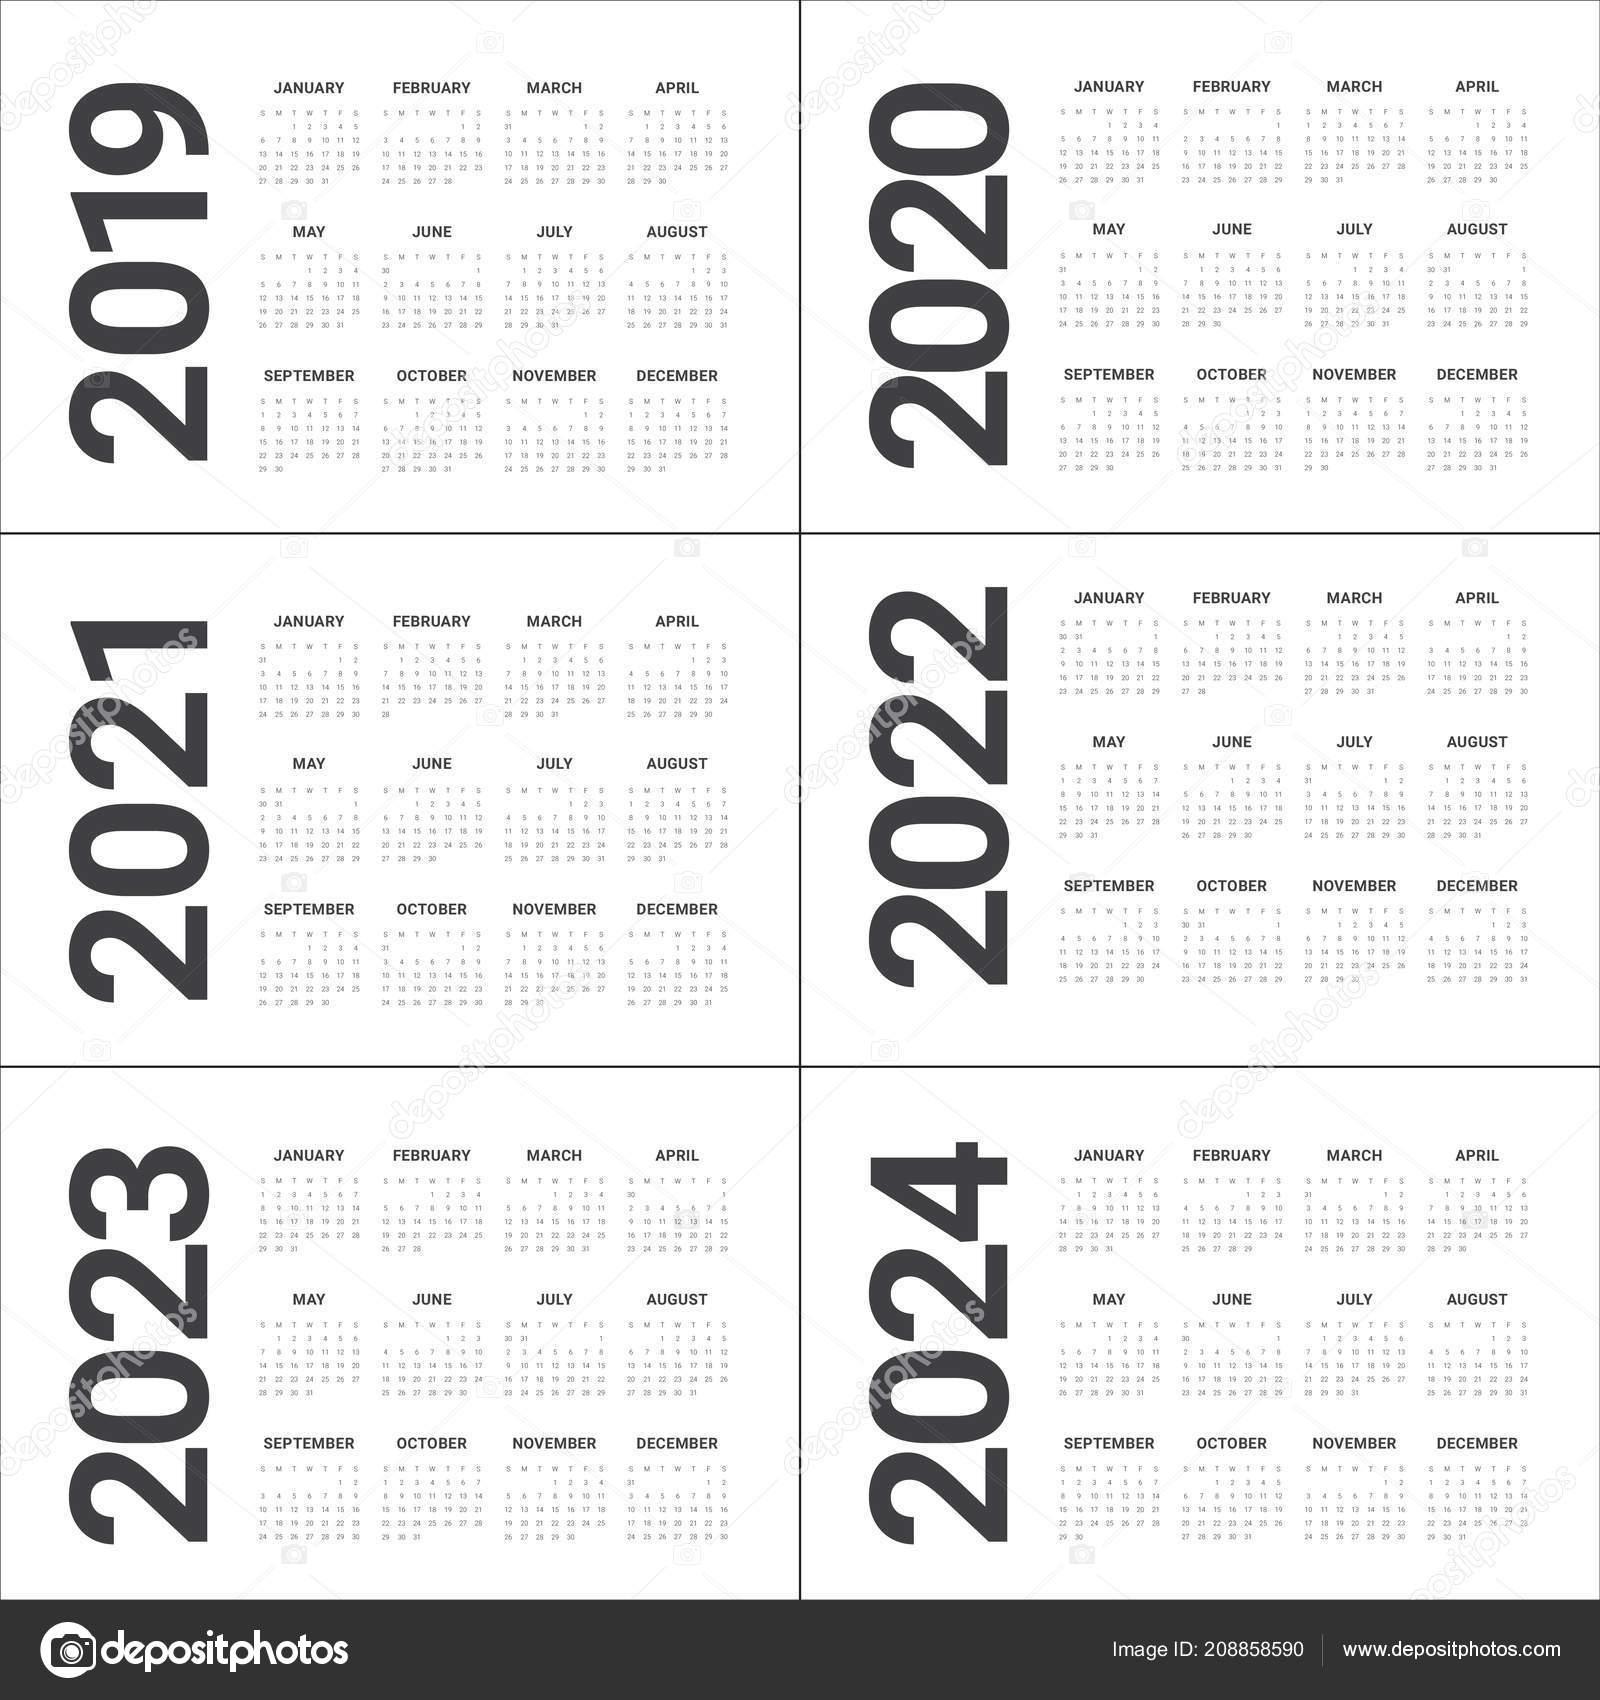 2023 Stock Vectors, Royalty Free 2023 Illustrations